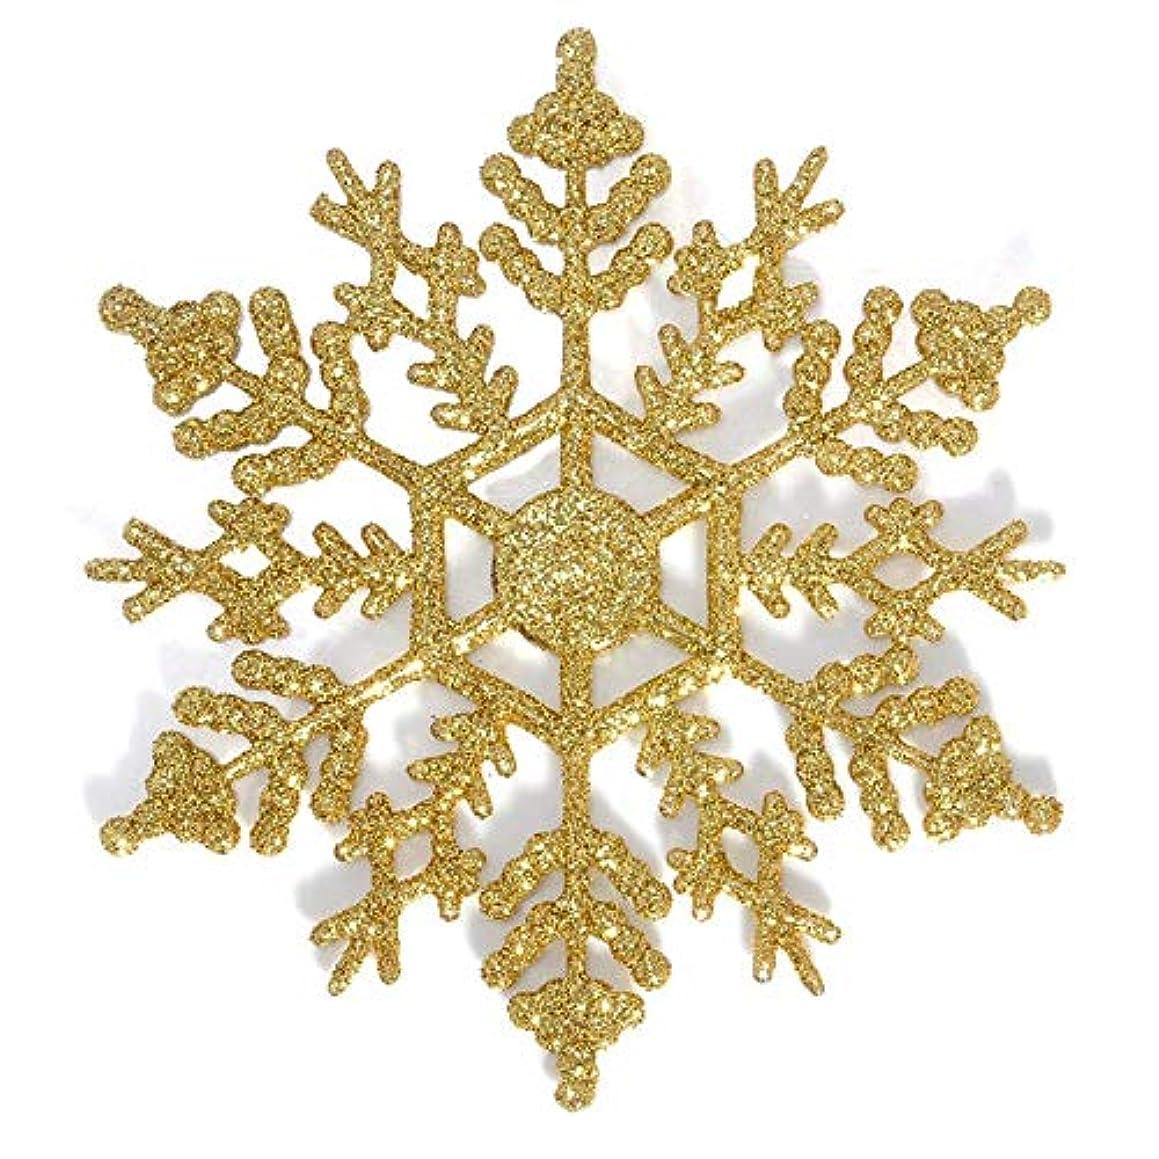 Artificial Snow & Snowflakes - 12 6pcs 10 9cm Christmas Snowflakes Plastic Glitter Fake Snow Ornaments Tree Pendant Party - Chain Pine Snow Instant Pink Fake Magic Snow Snow Instant Mens Ice